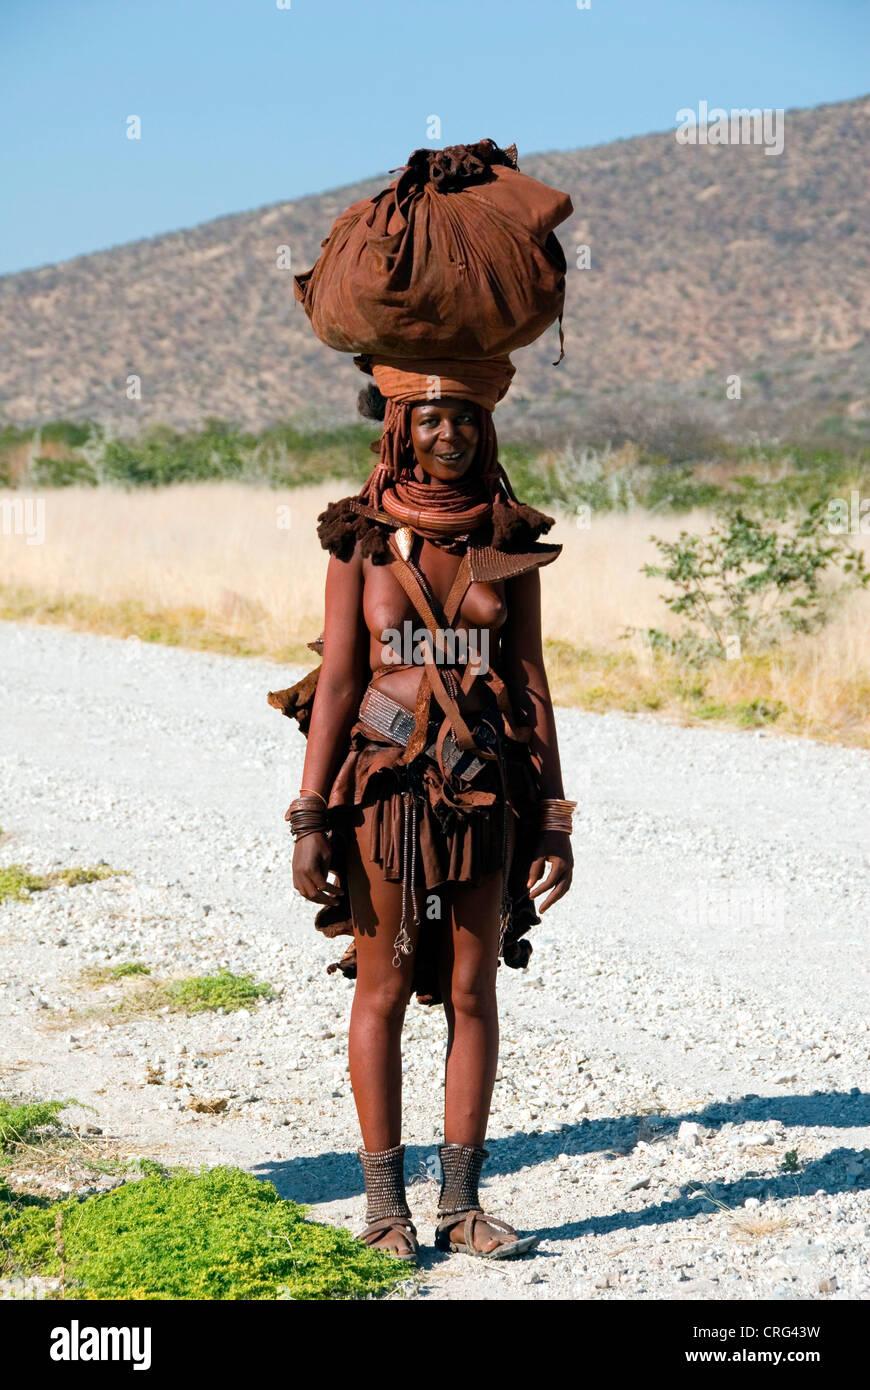 Partnervermittlung frauen namibia